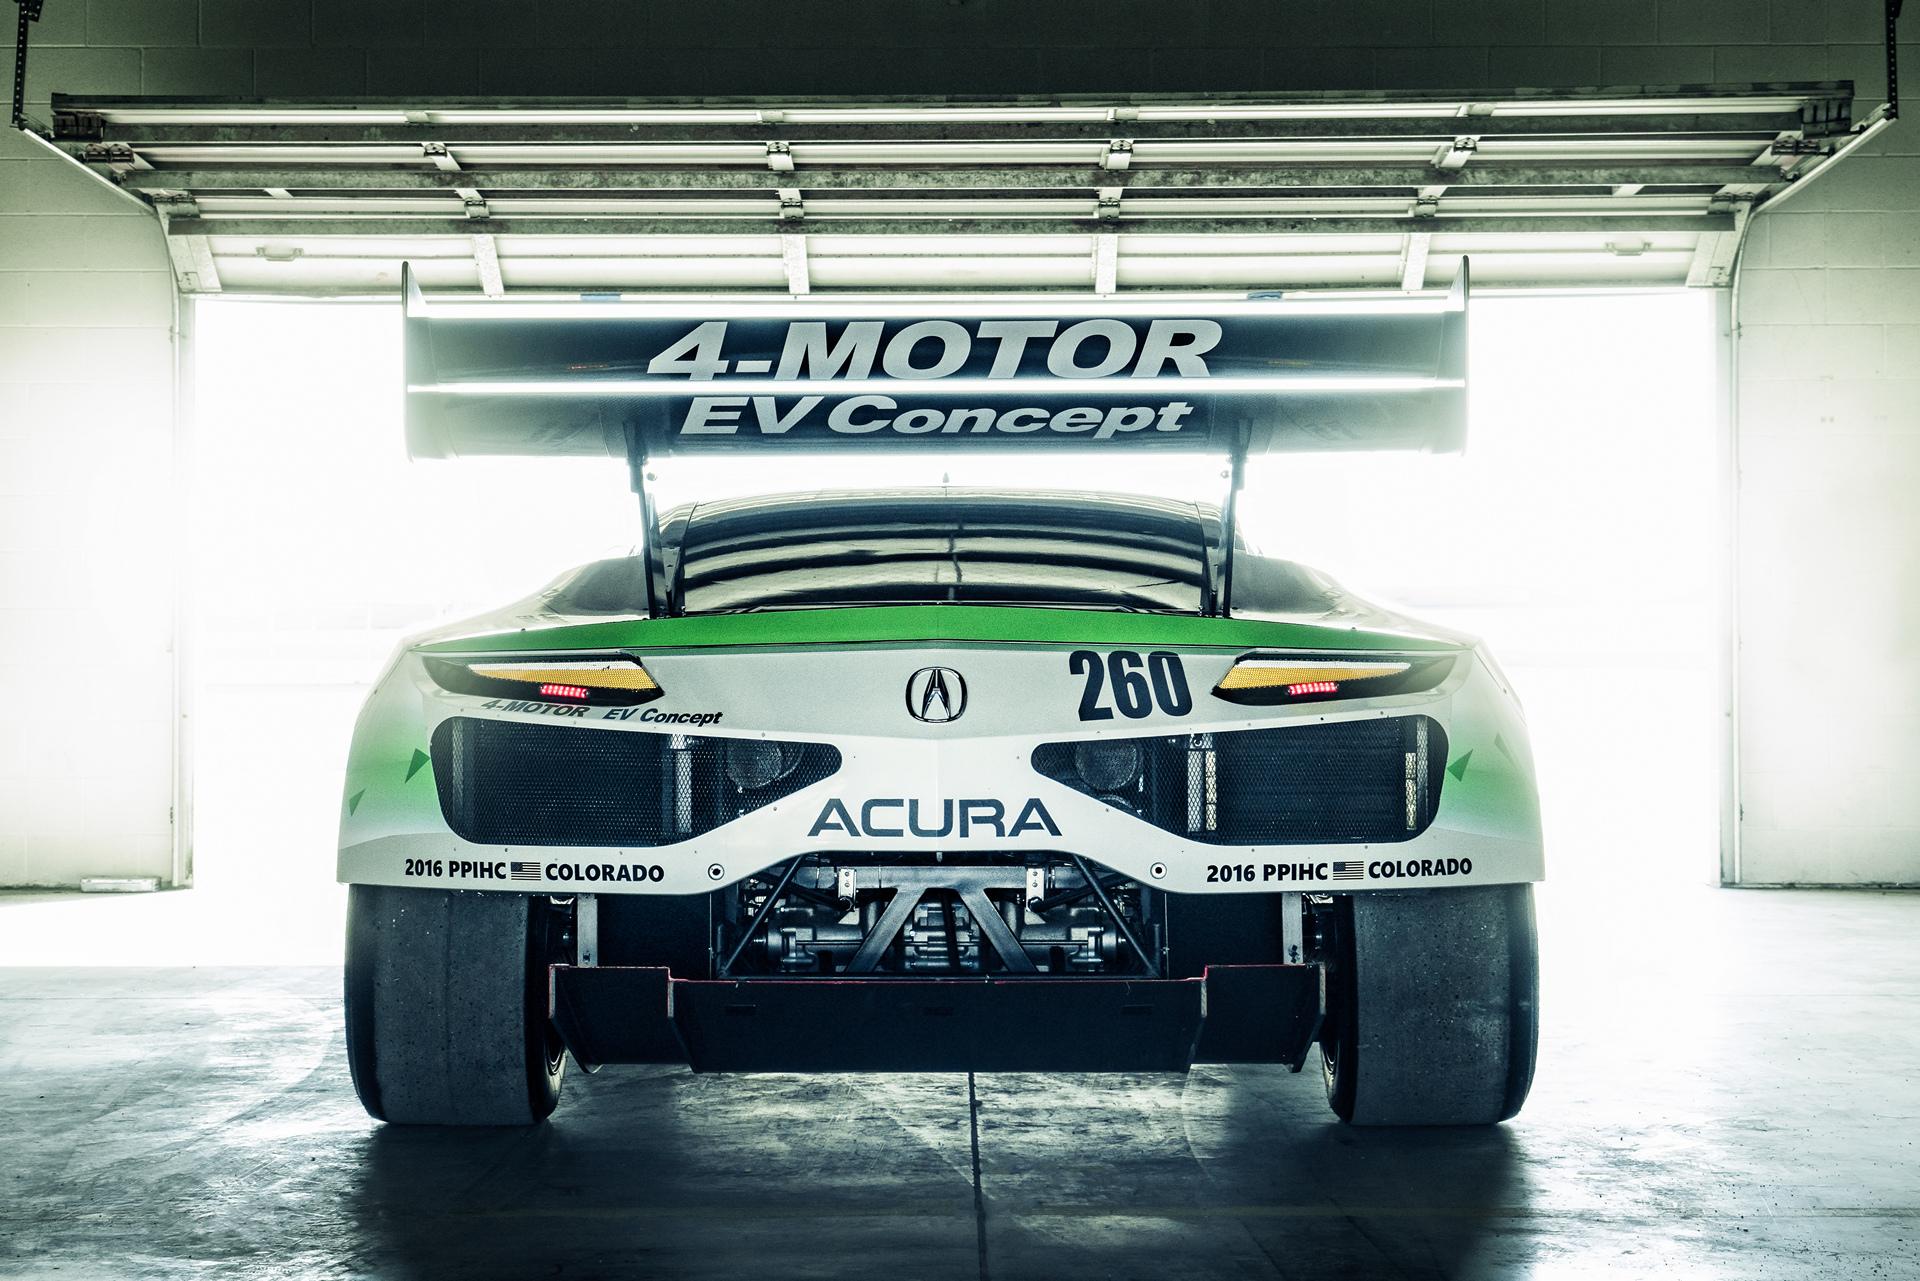 Acura EV Concept © Honda Motor Co., Ltd.